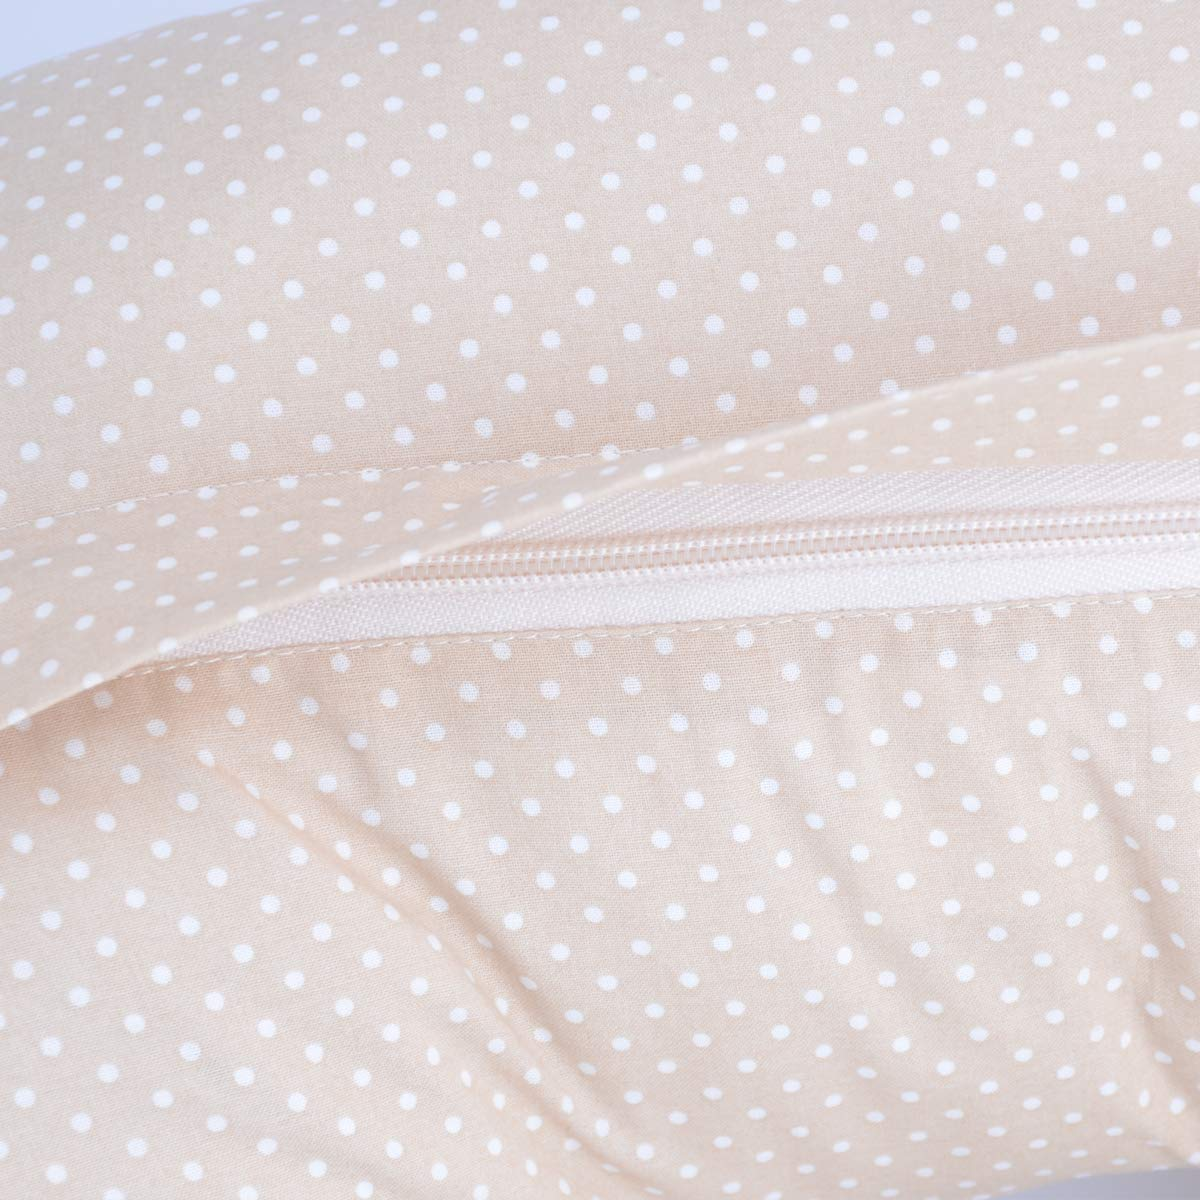 Amazon.com: PEKITAS - Funda de almohada para lactancia ...